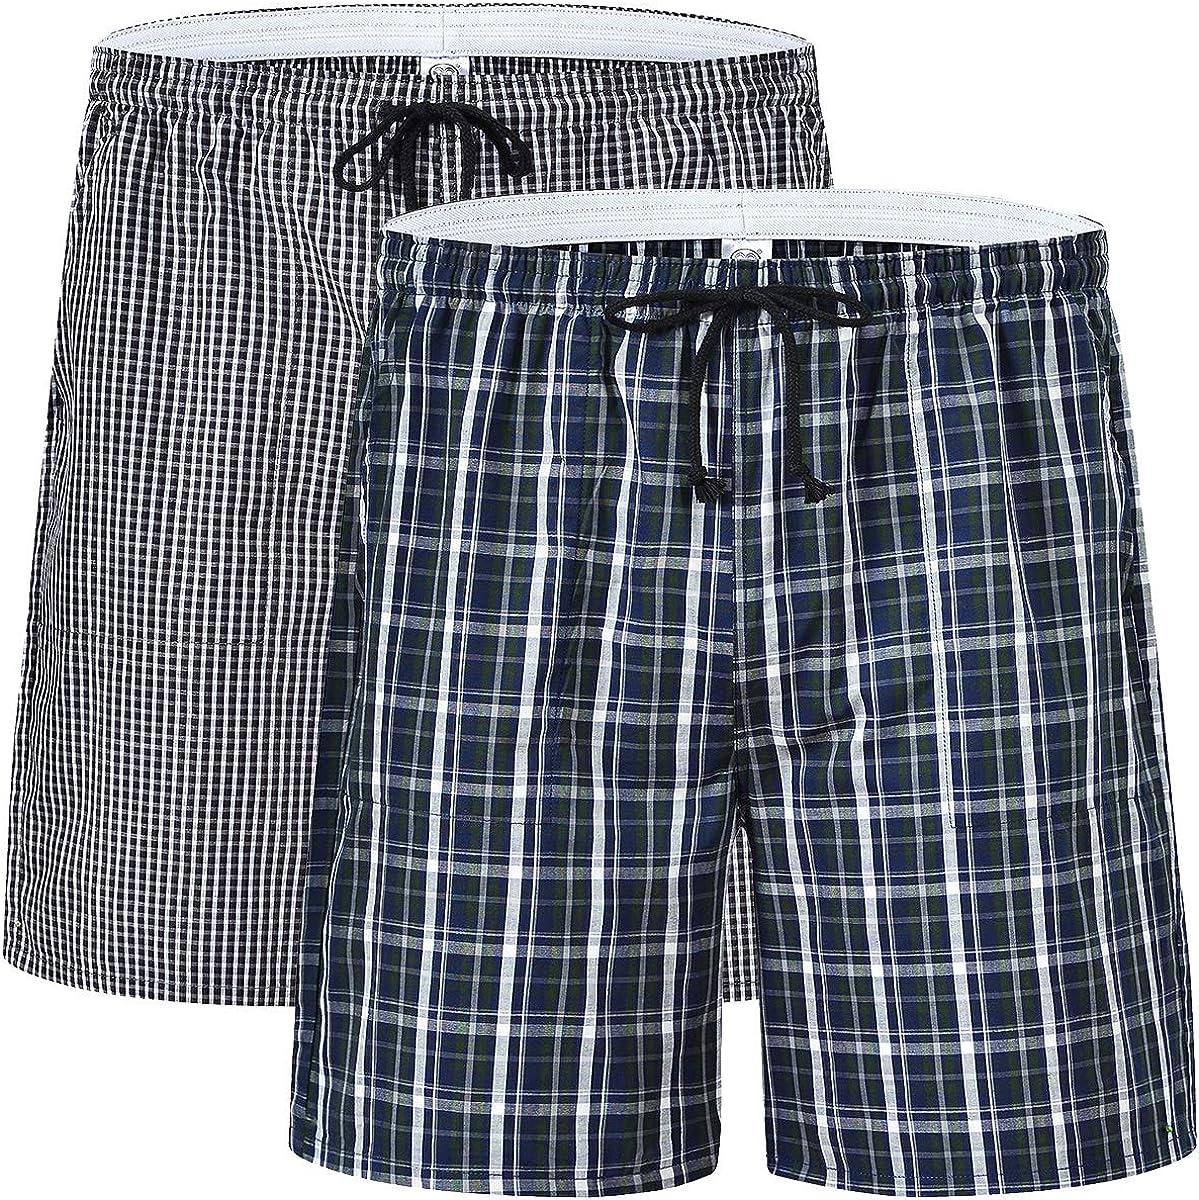 Men's Pajama Shorts Man Plaid Sleep Shorts Cotton Lounge Boxer Shorts with Pockets